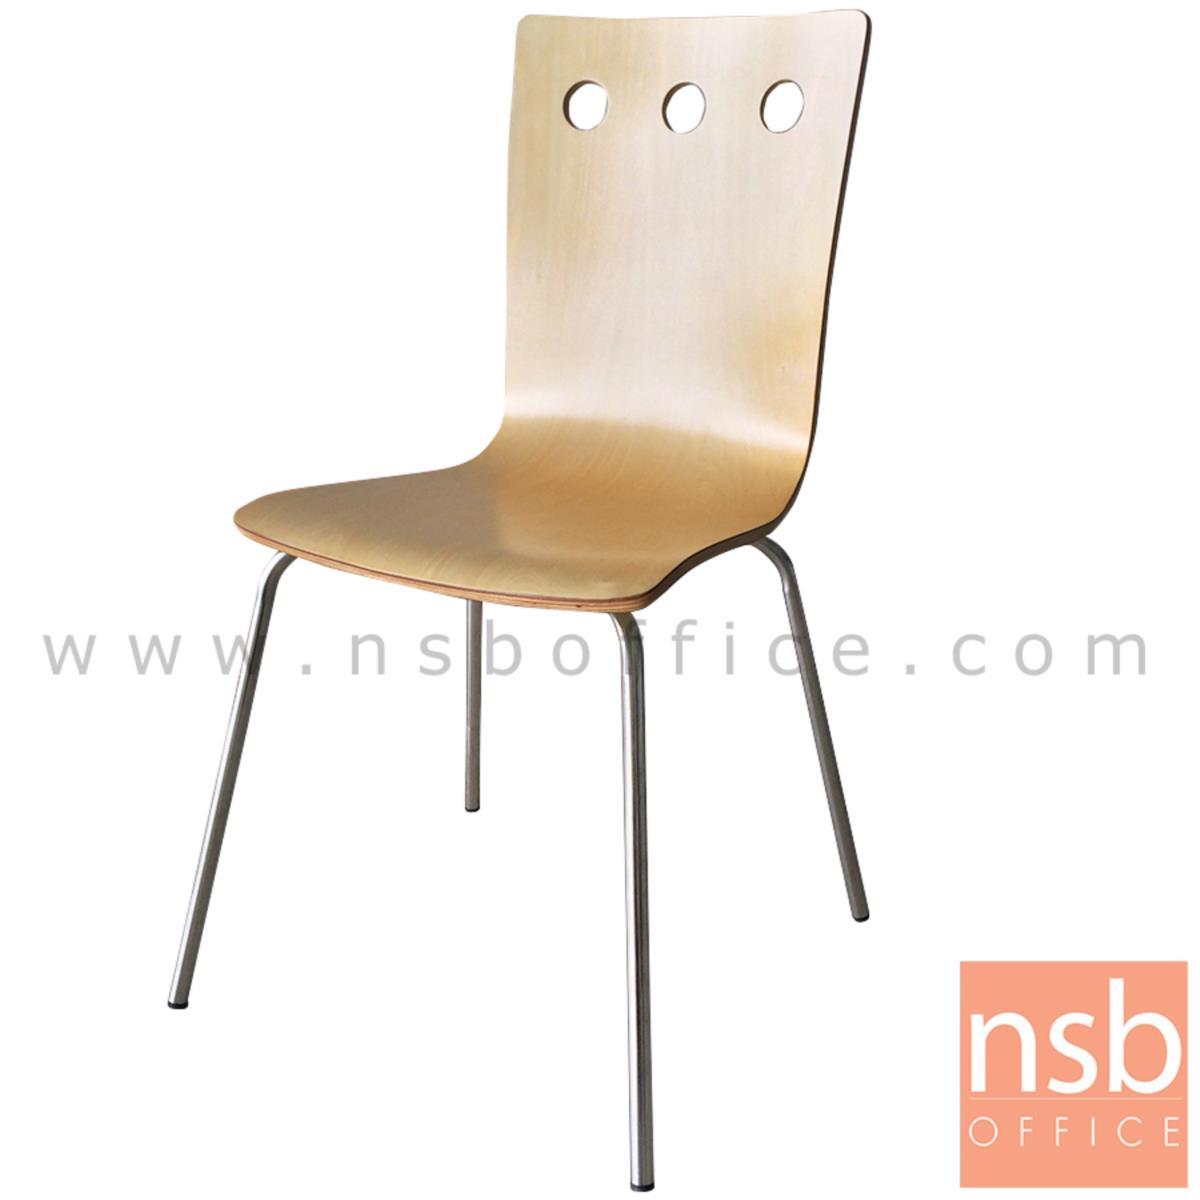 B20A109:เก้าอี้อเนกประสงค์ไม้ สูงพิเศษ รุ่น Greensboro (กรีนส์โบโร)  ขาสแตนเลส